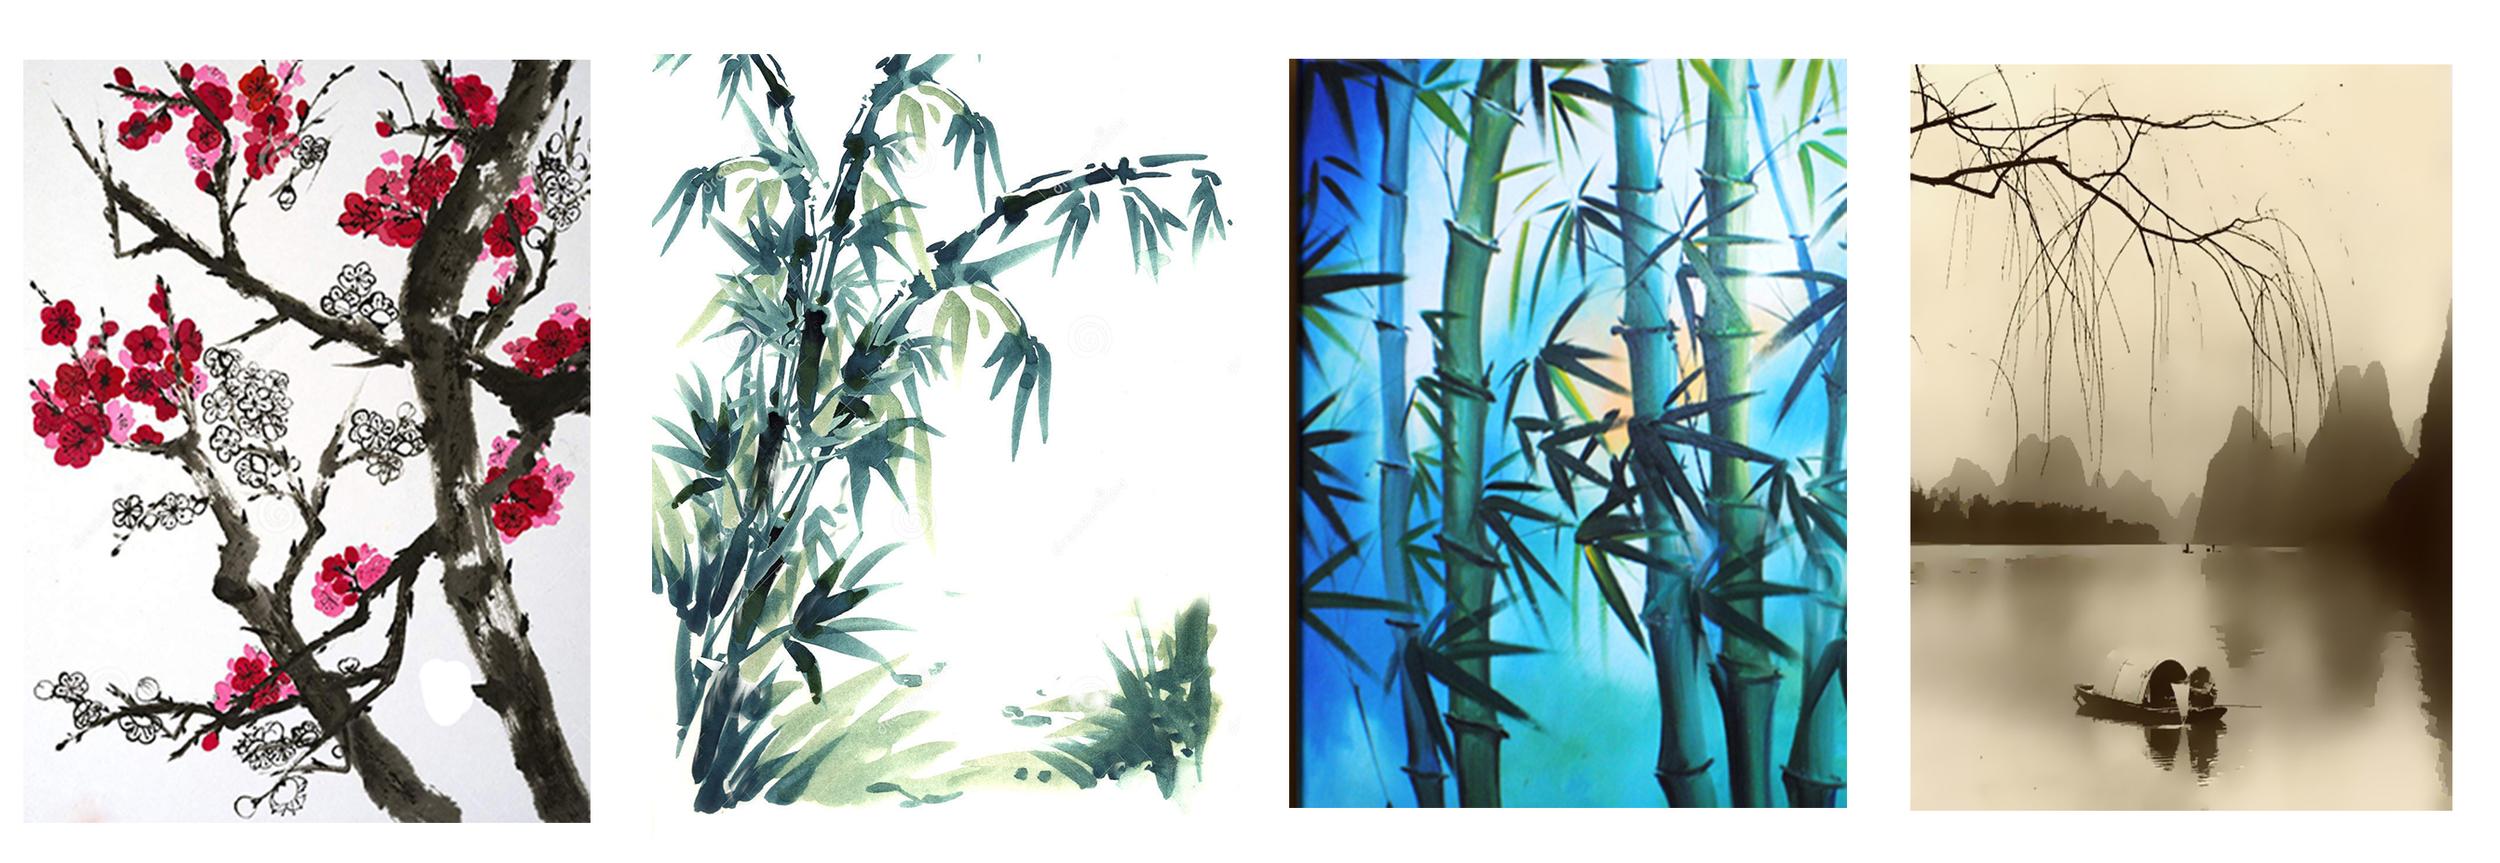 Four Session Asian Art Series! Sept-Dec 2015 @ KABUKI, Glendale Heights, IL